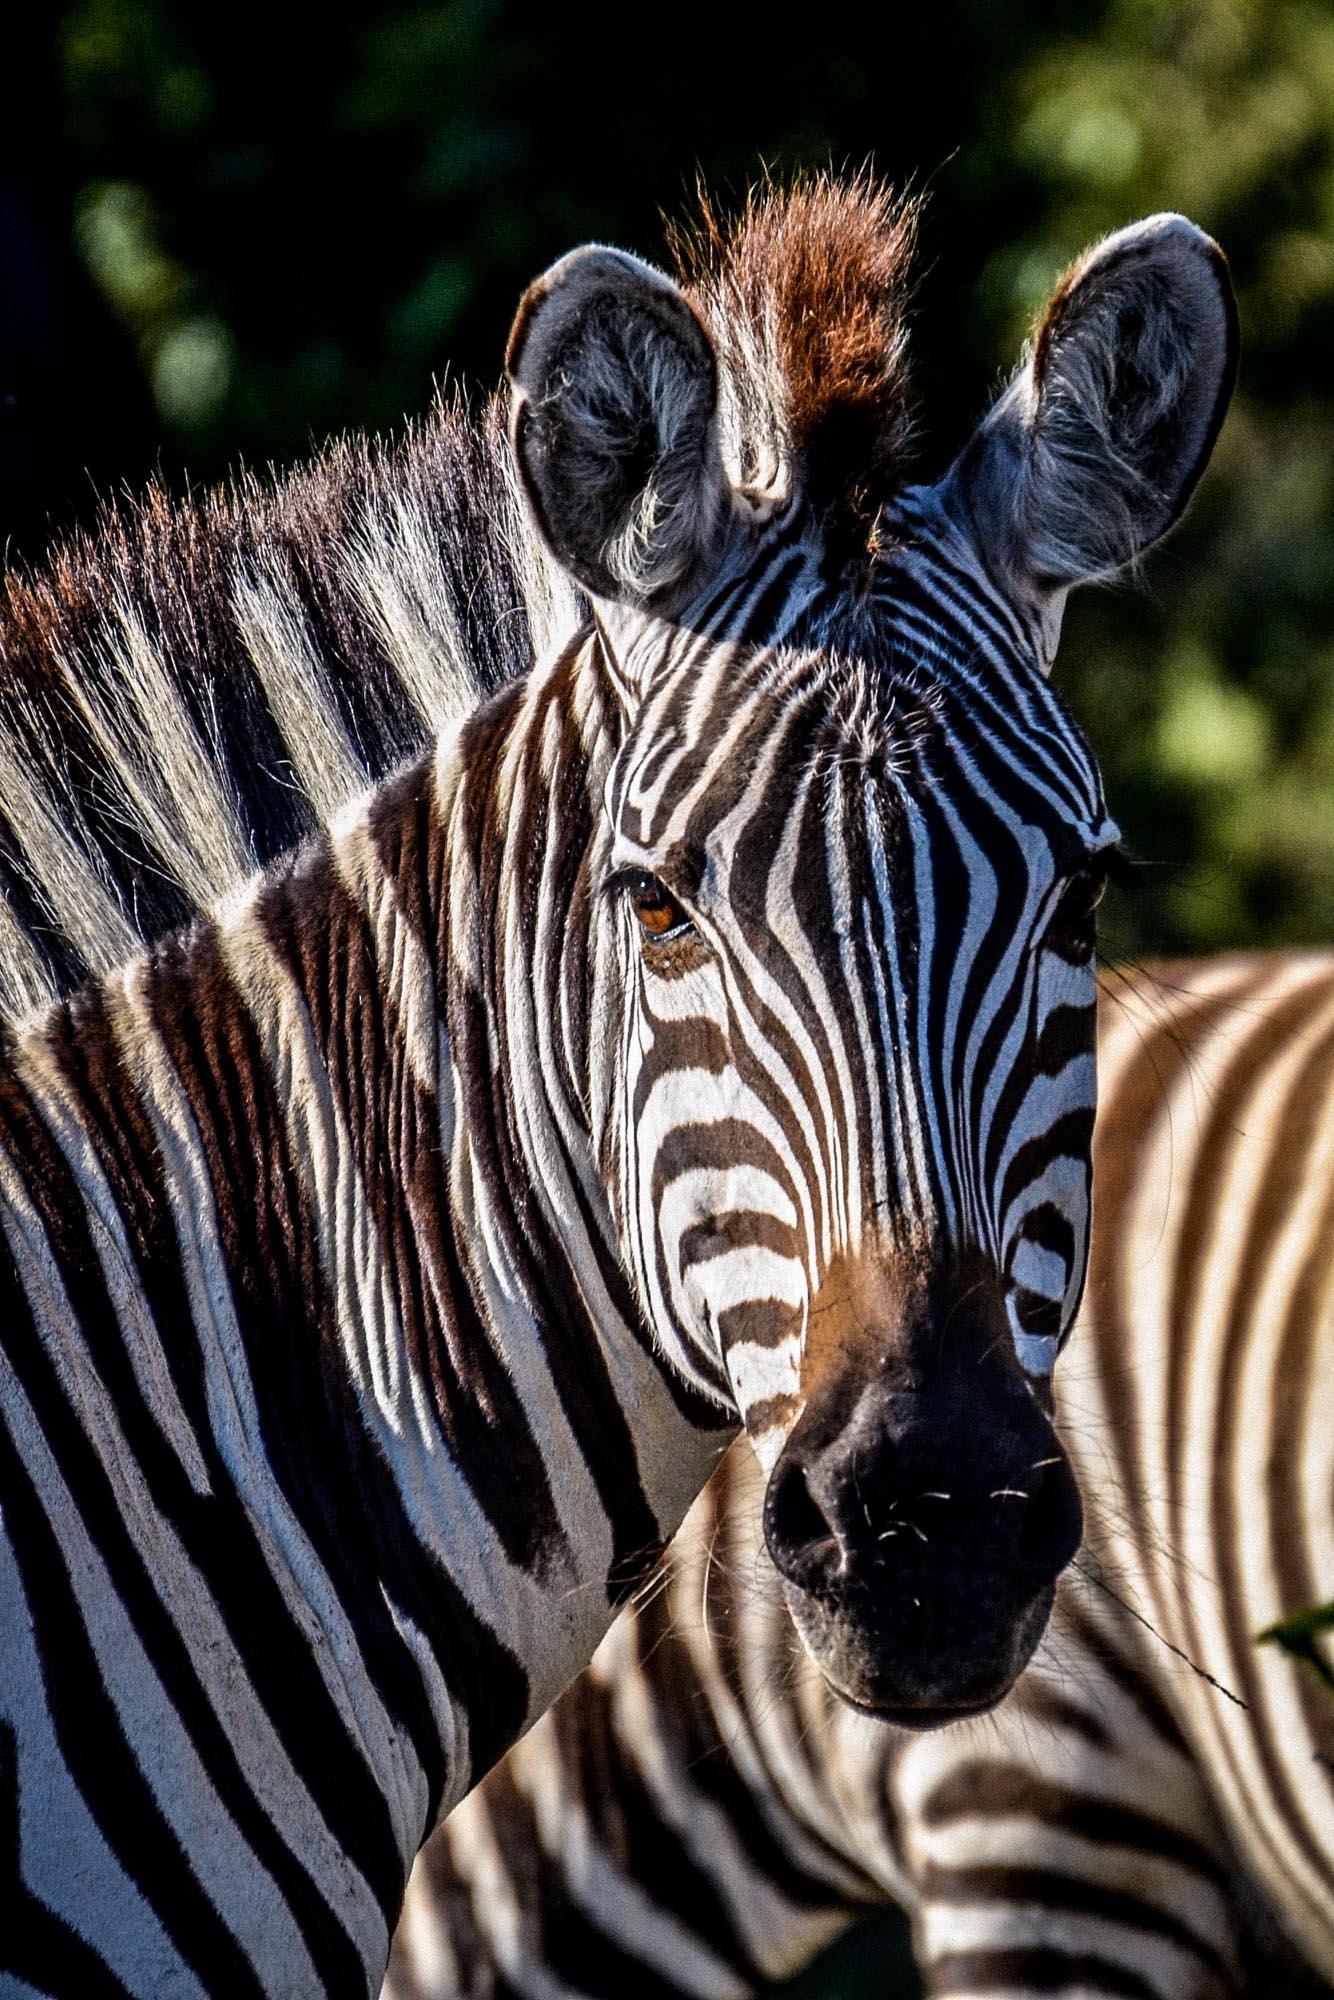 zebra-bw-headshot-mara-kenya-2011-10-26.jpg